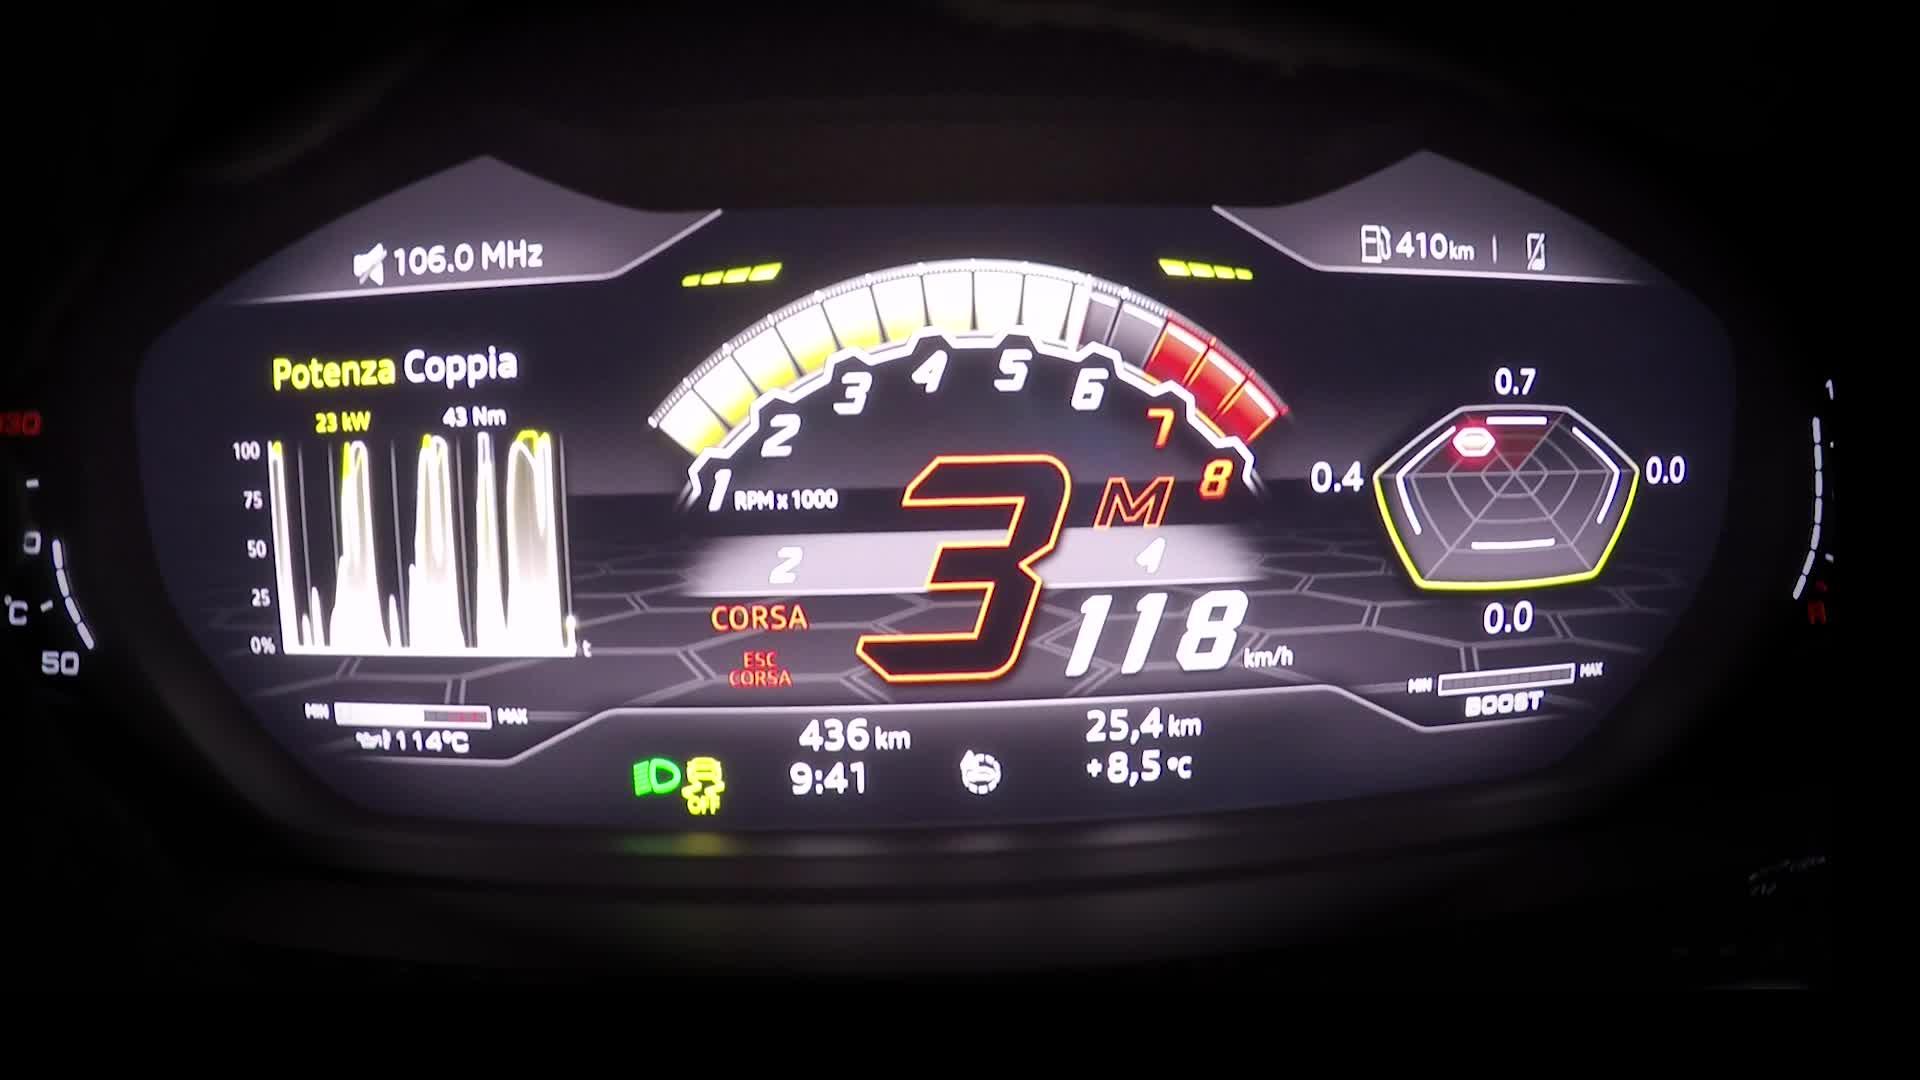 Footage_Racetrack_Mounte